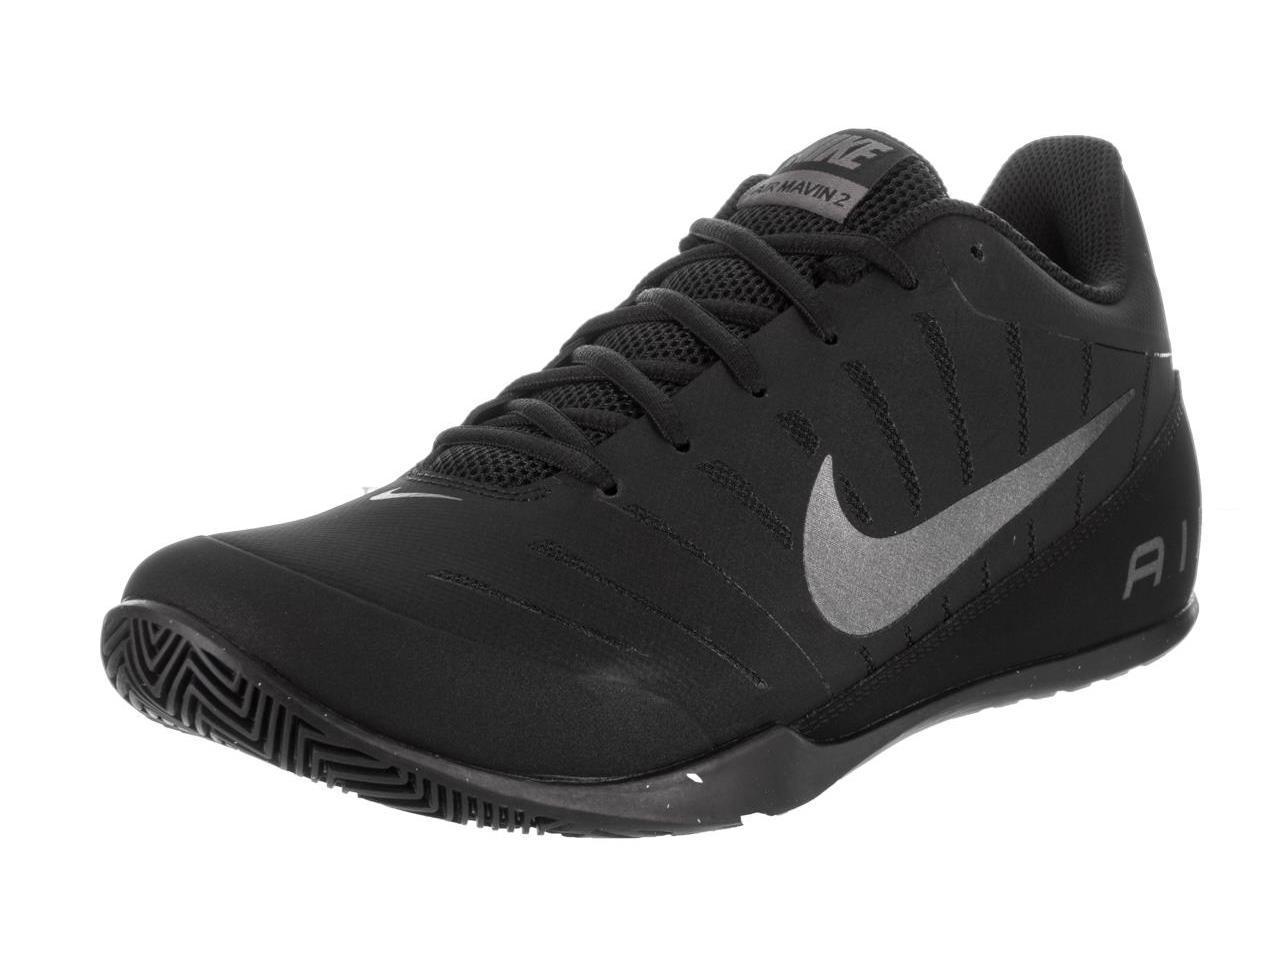 Nike Men's Nbk Air Mavin Low 2 Nbk Men's Basketball Shoe 46b34f